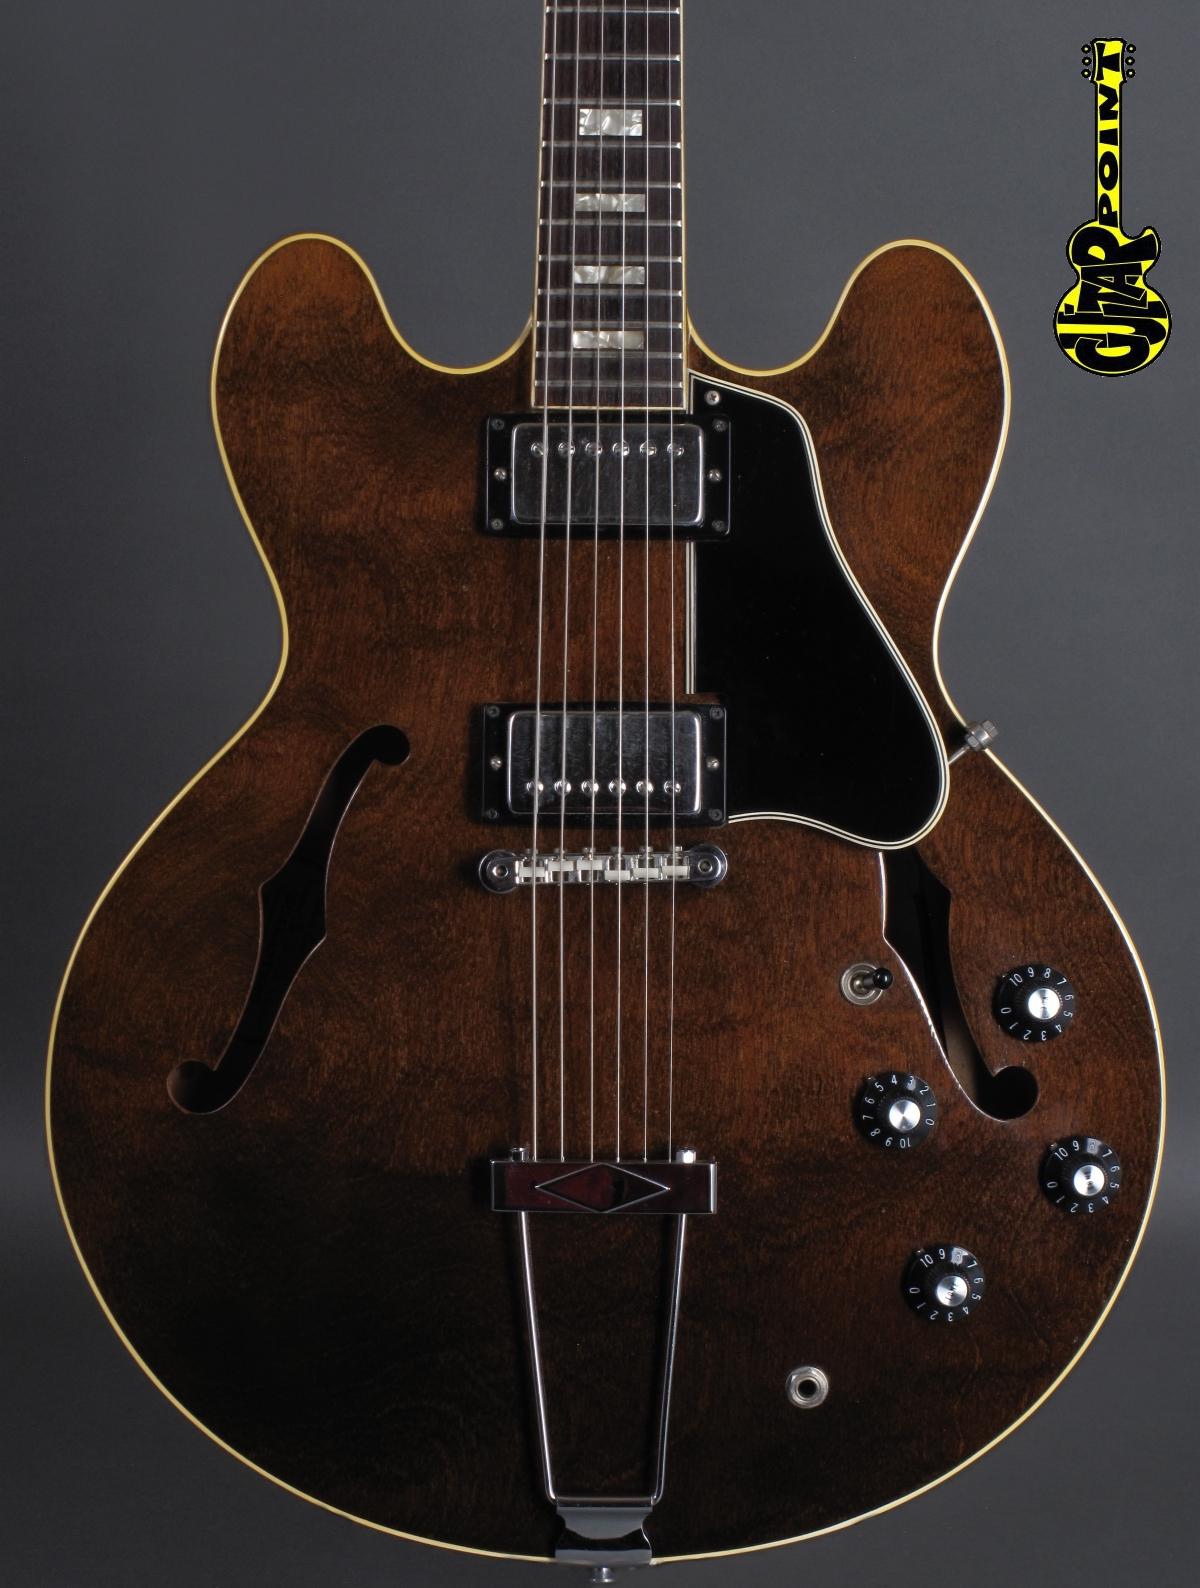 1971 Gibson ES-340 TDW - Walnut